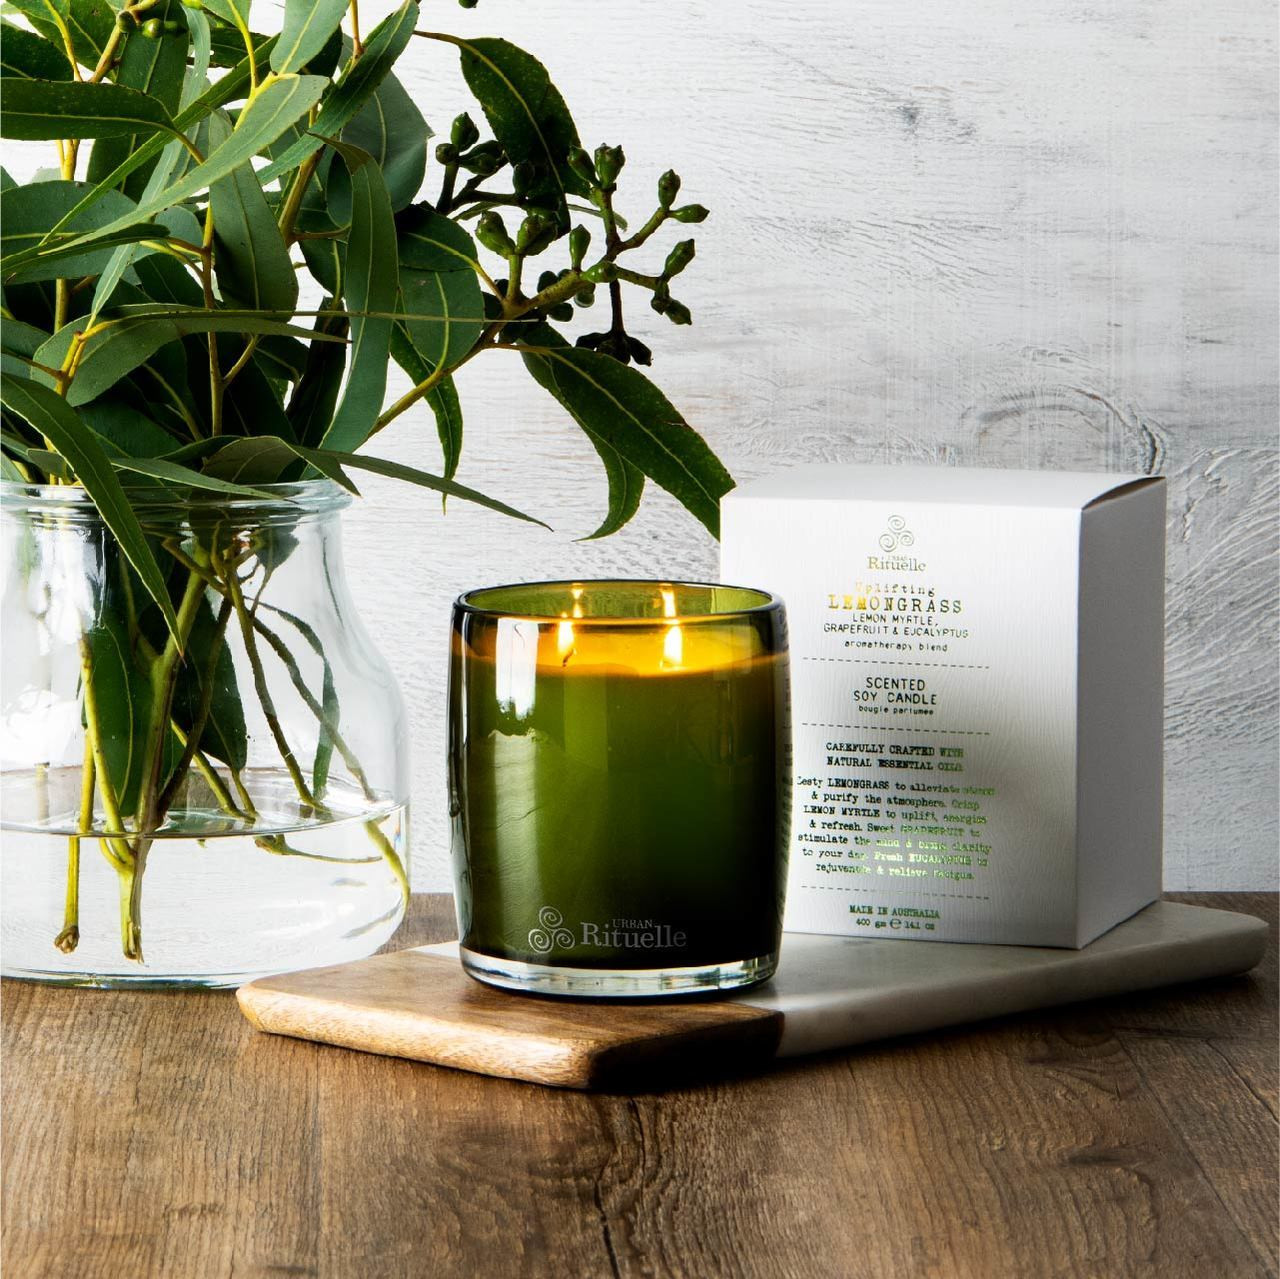 Flourish Organics - Lemongrass - Scented Soy Candle - Urban Rituelle